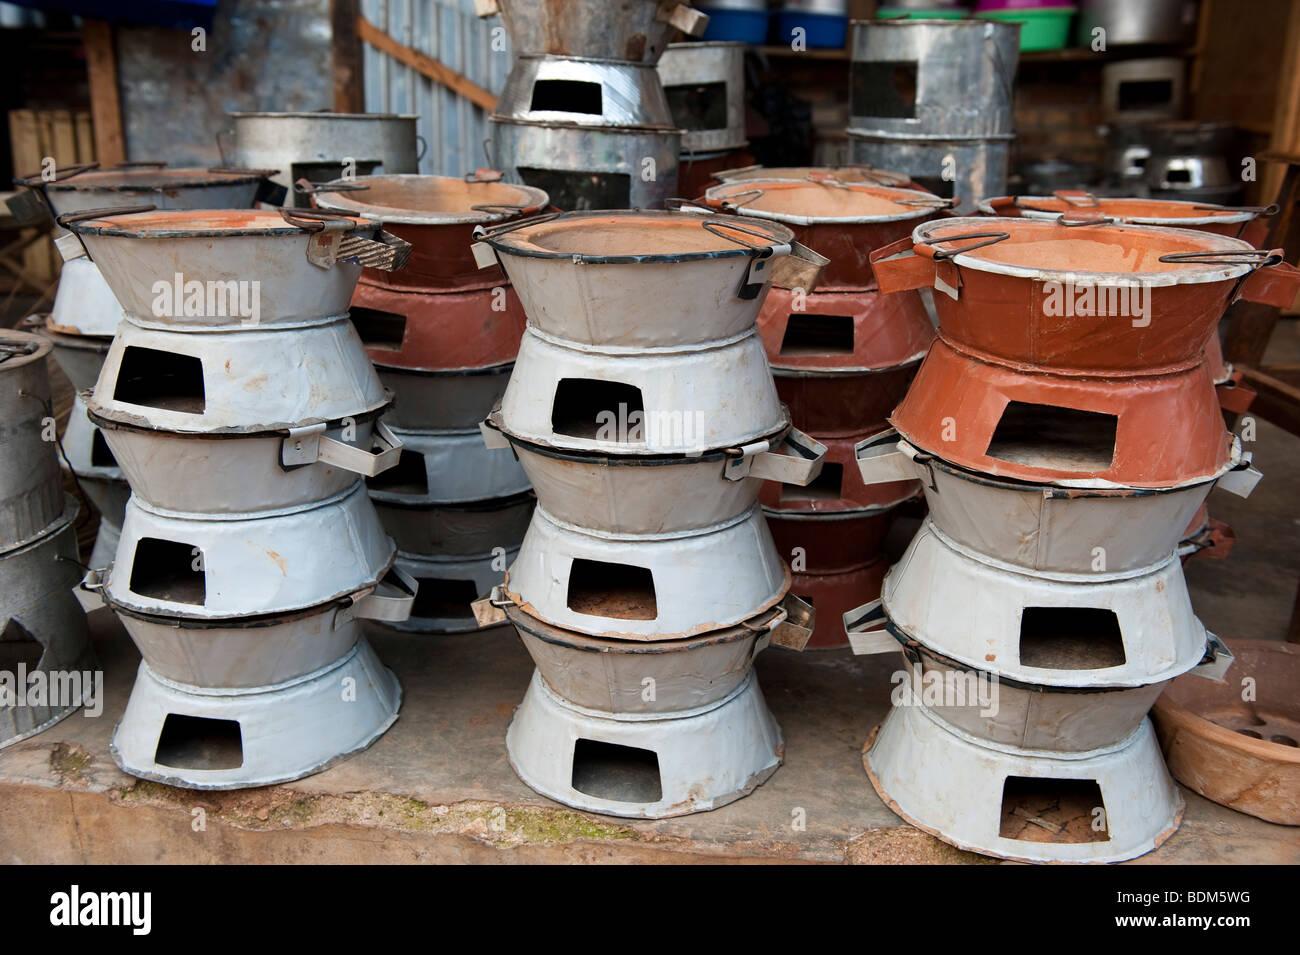 stoves for sale in the market, Kigali, Rwanda - Stock Image